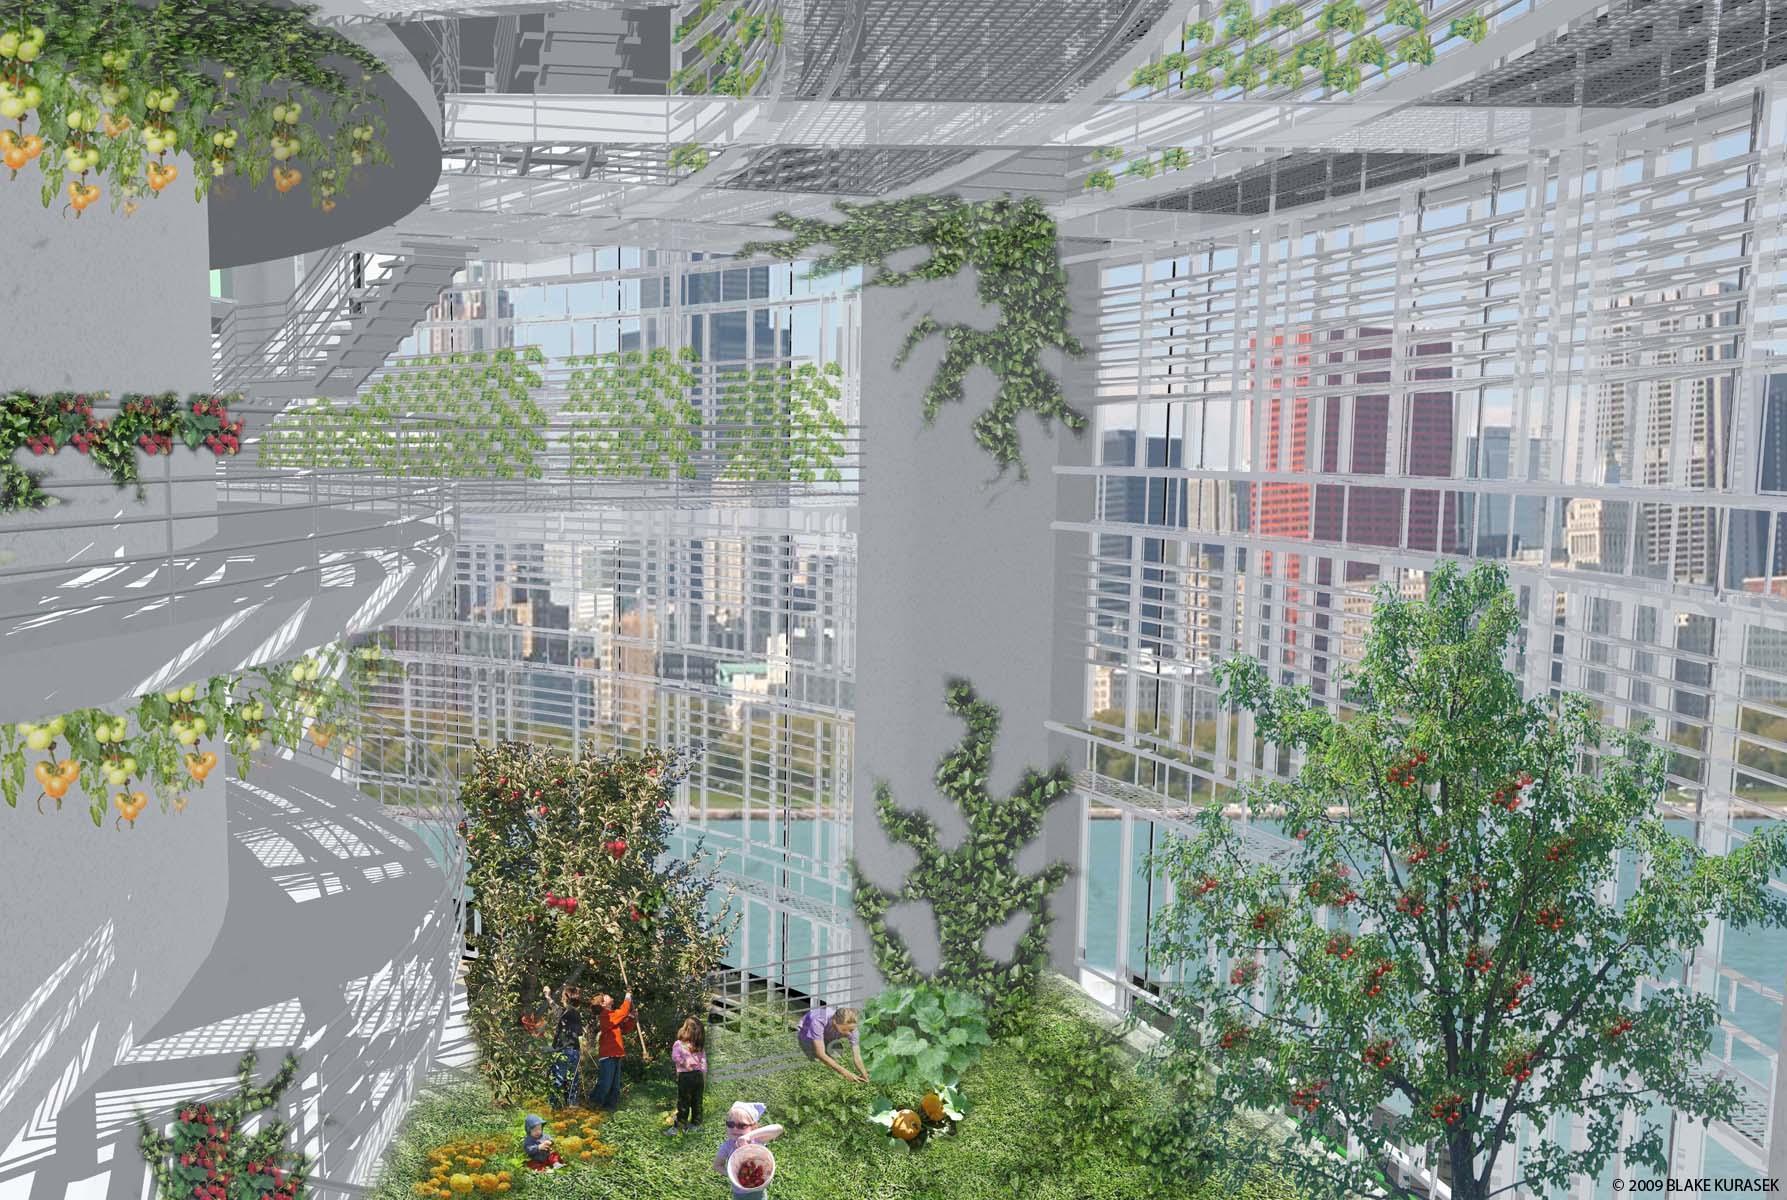 http://www.verticalfarm.com/Images/design/livingskyscraper/Blake%20Kurasek%20Interior2-Chicago-COPYRIGHT2009.jpg